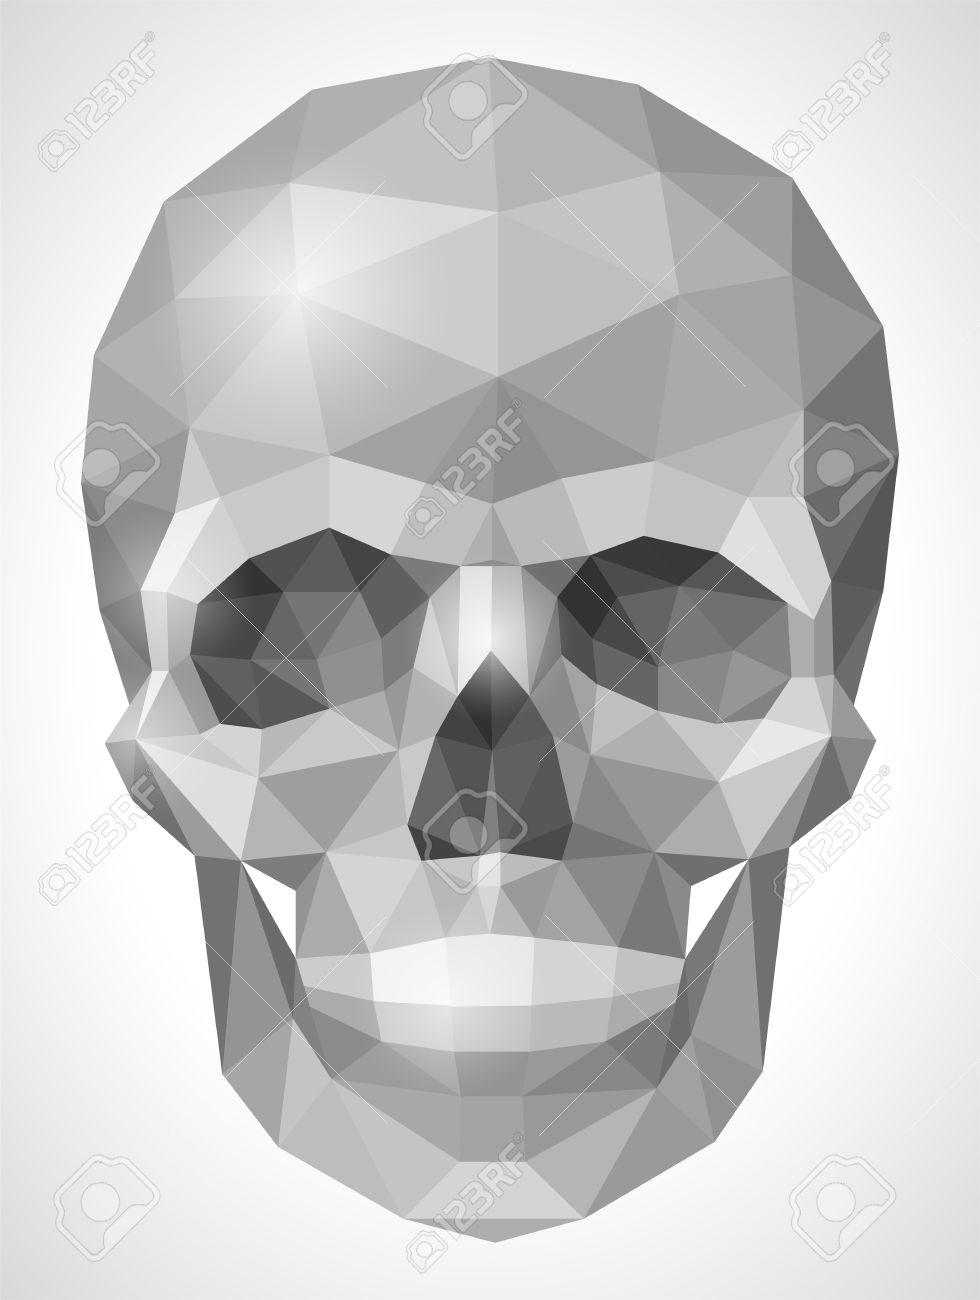 Human Skull In Origami Style Stock Vector